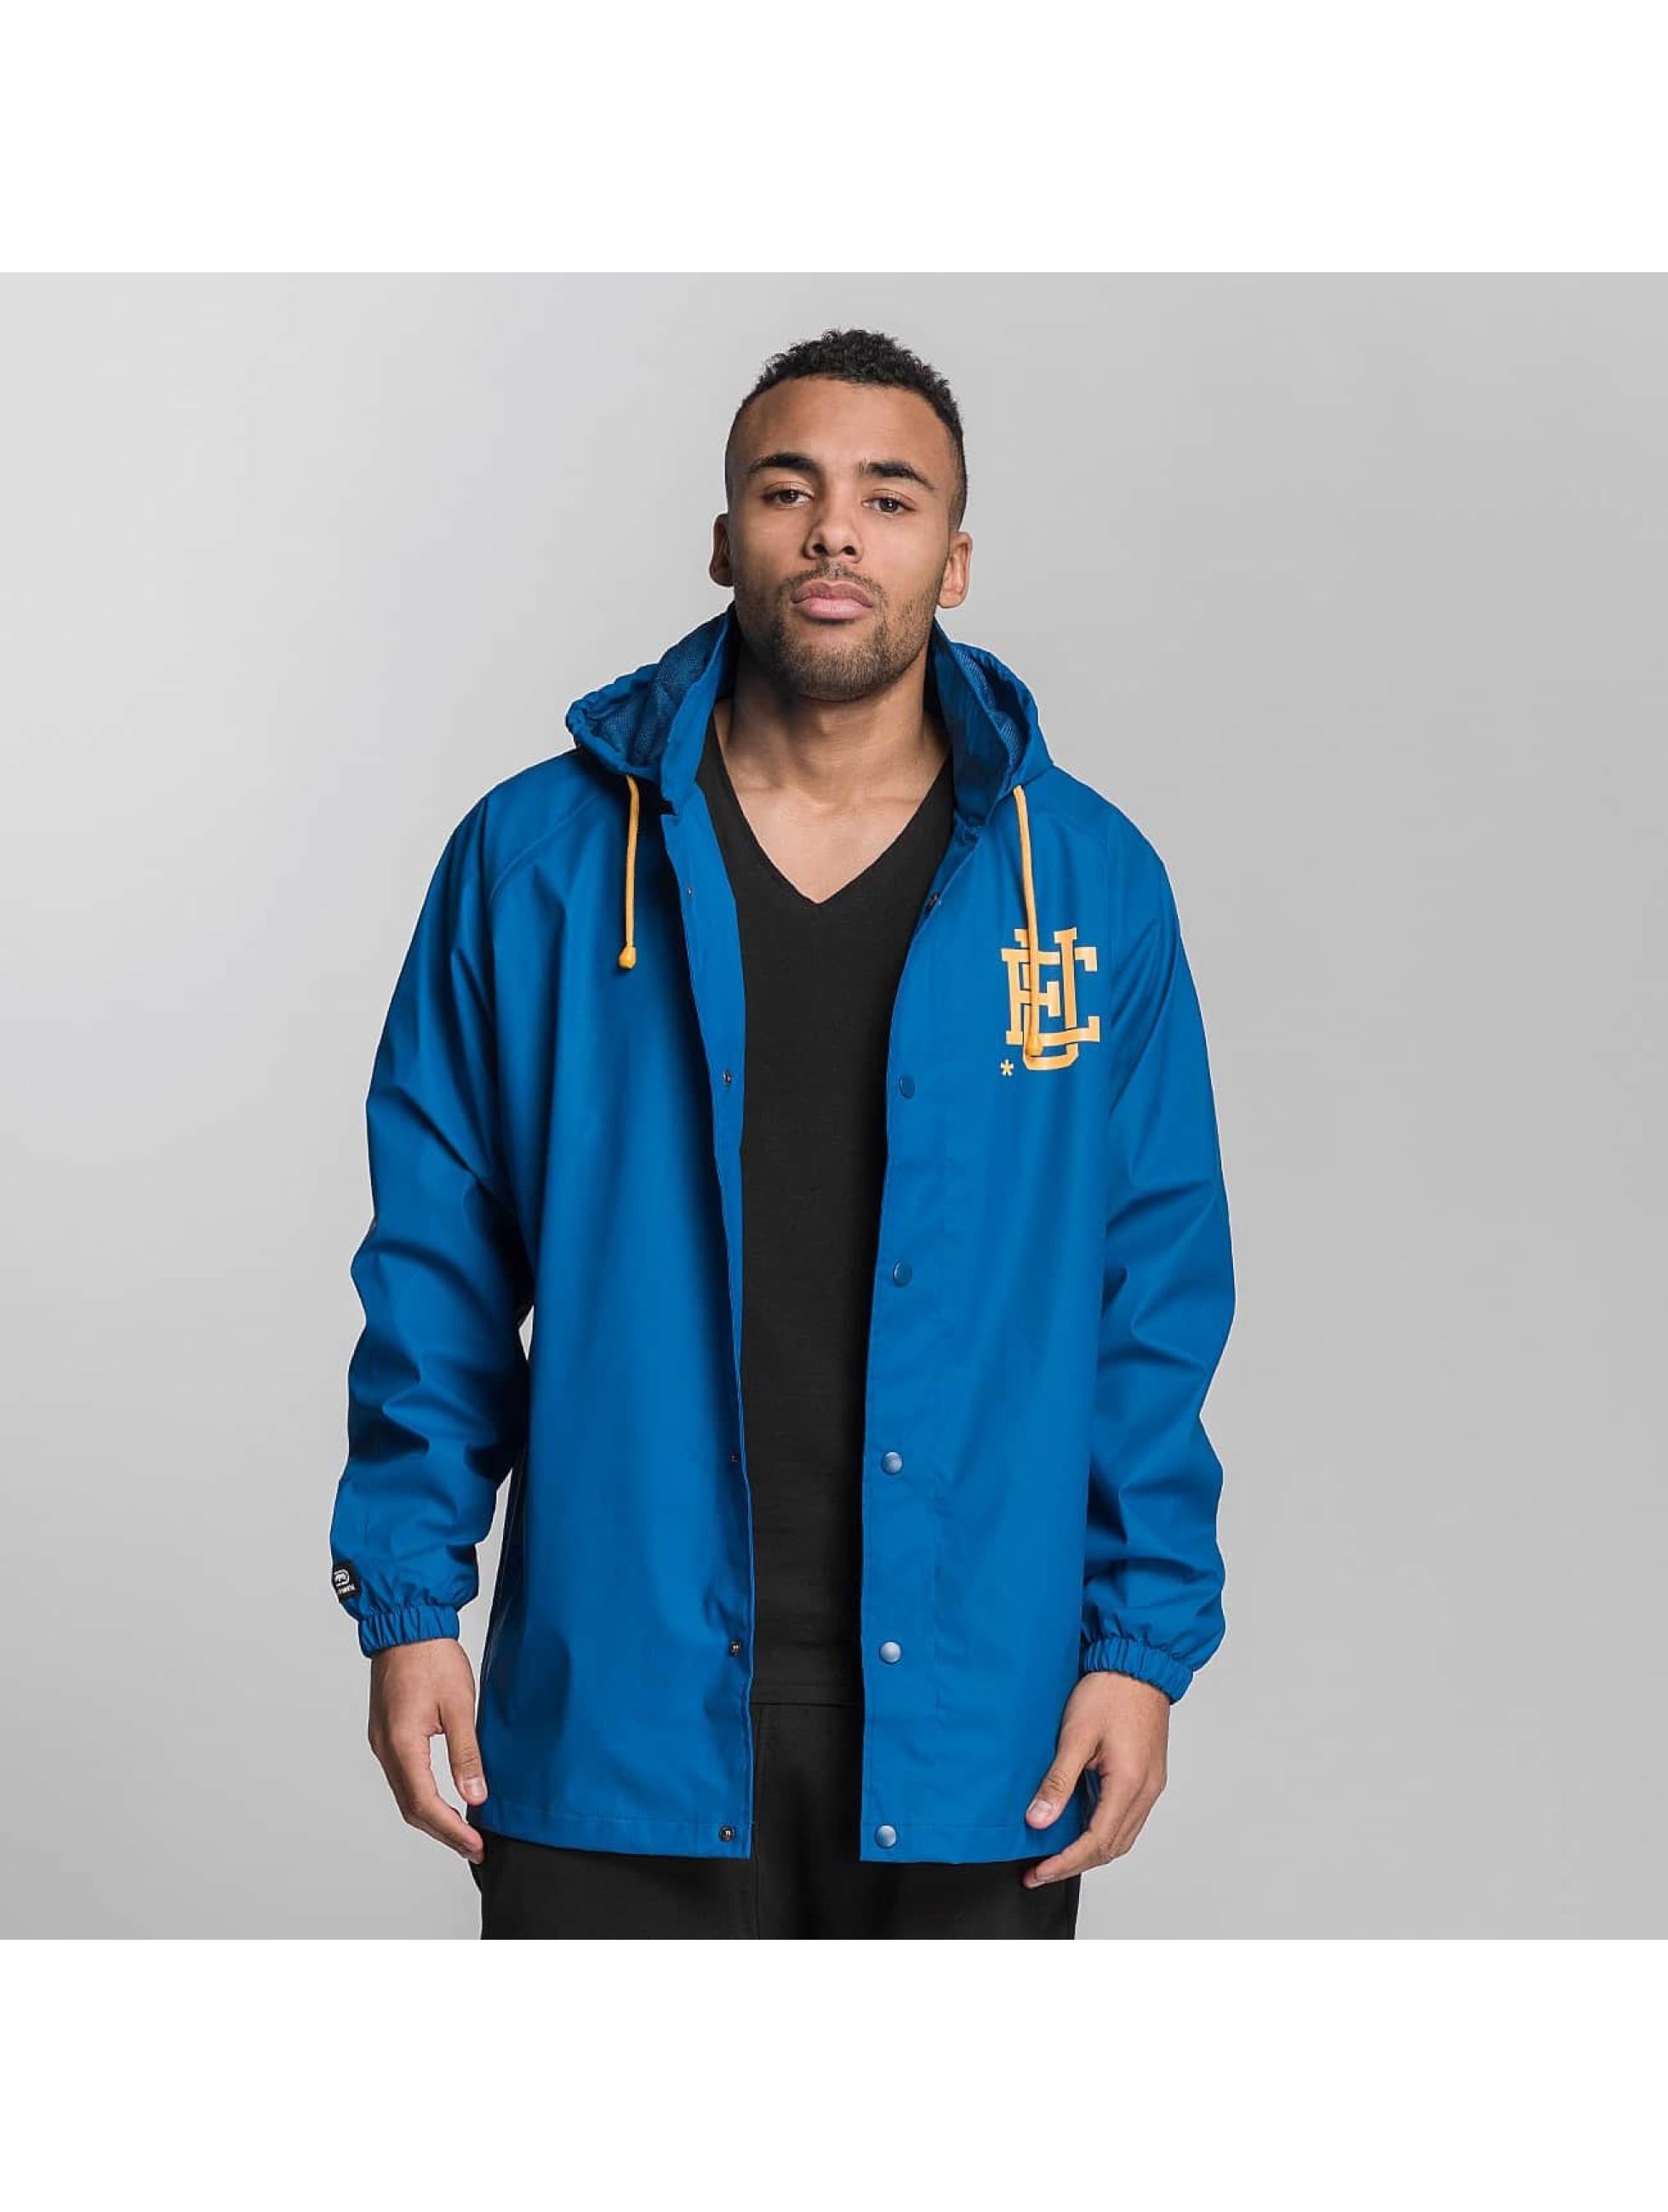 Ecko Unltd. / Lightweight Jacket Raining Man in blue 2XL